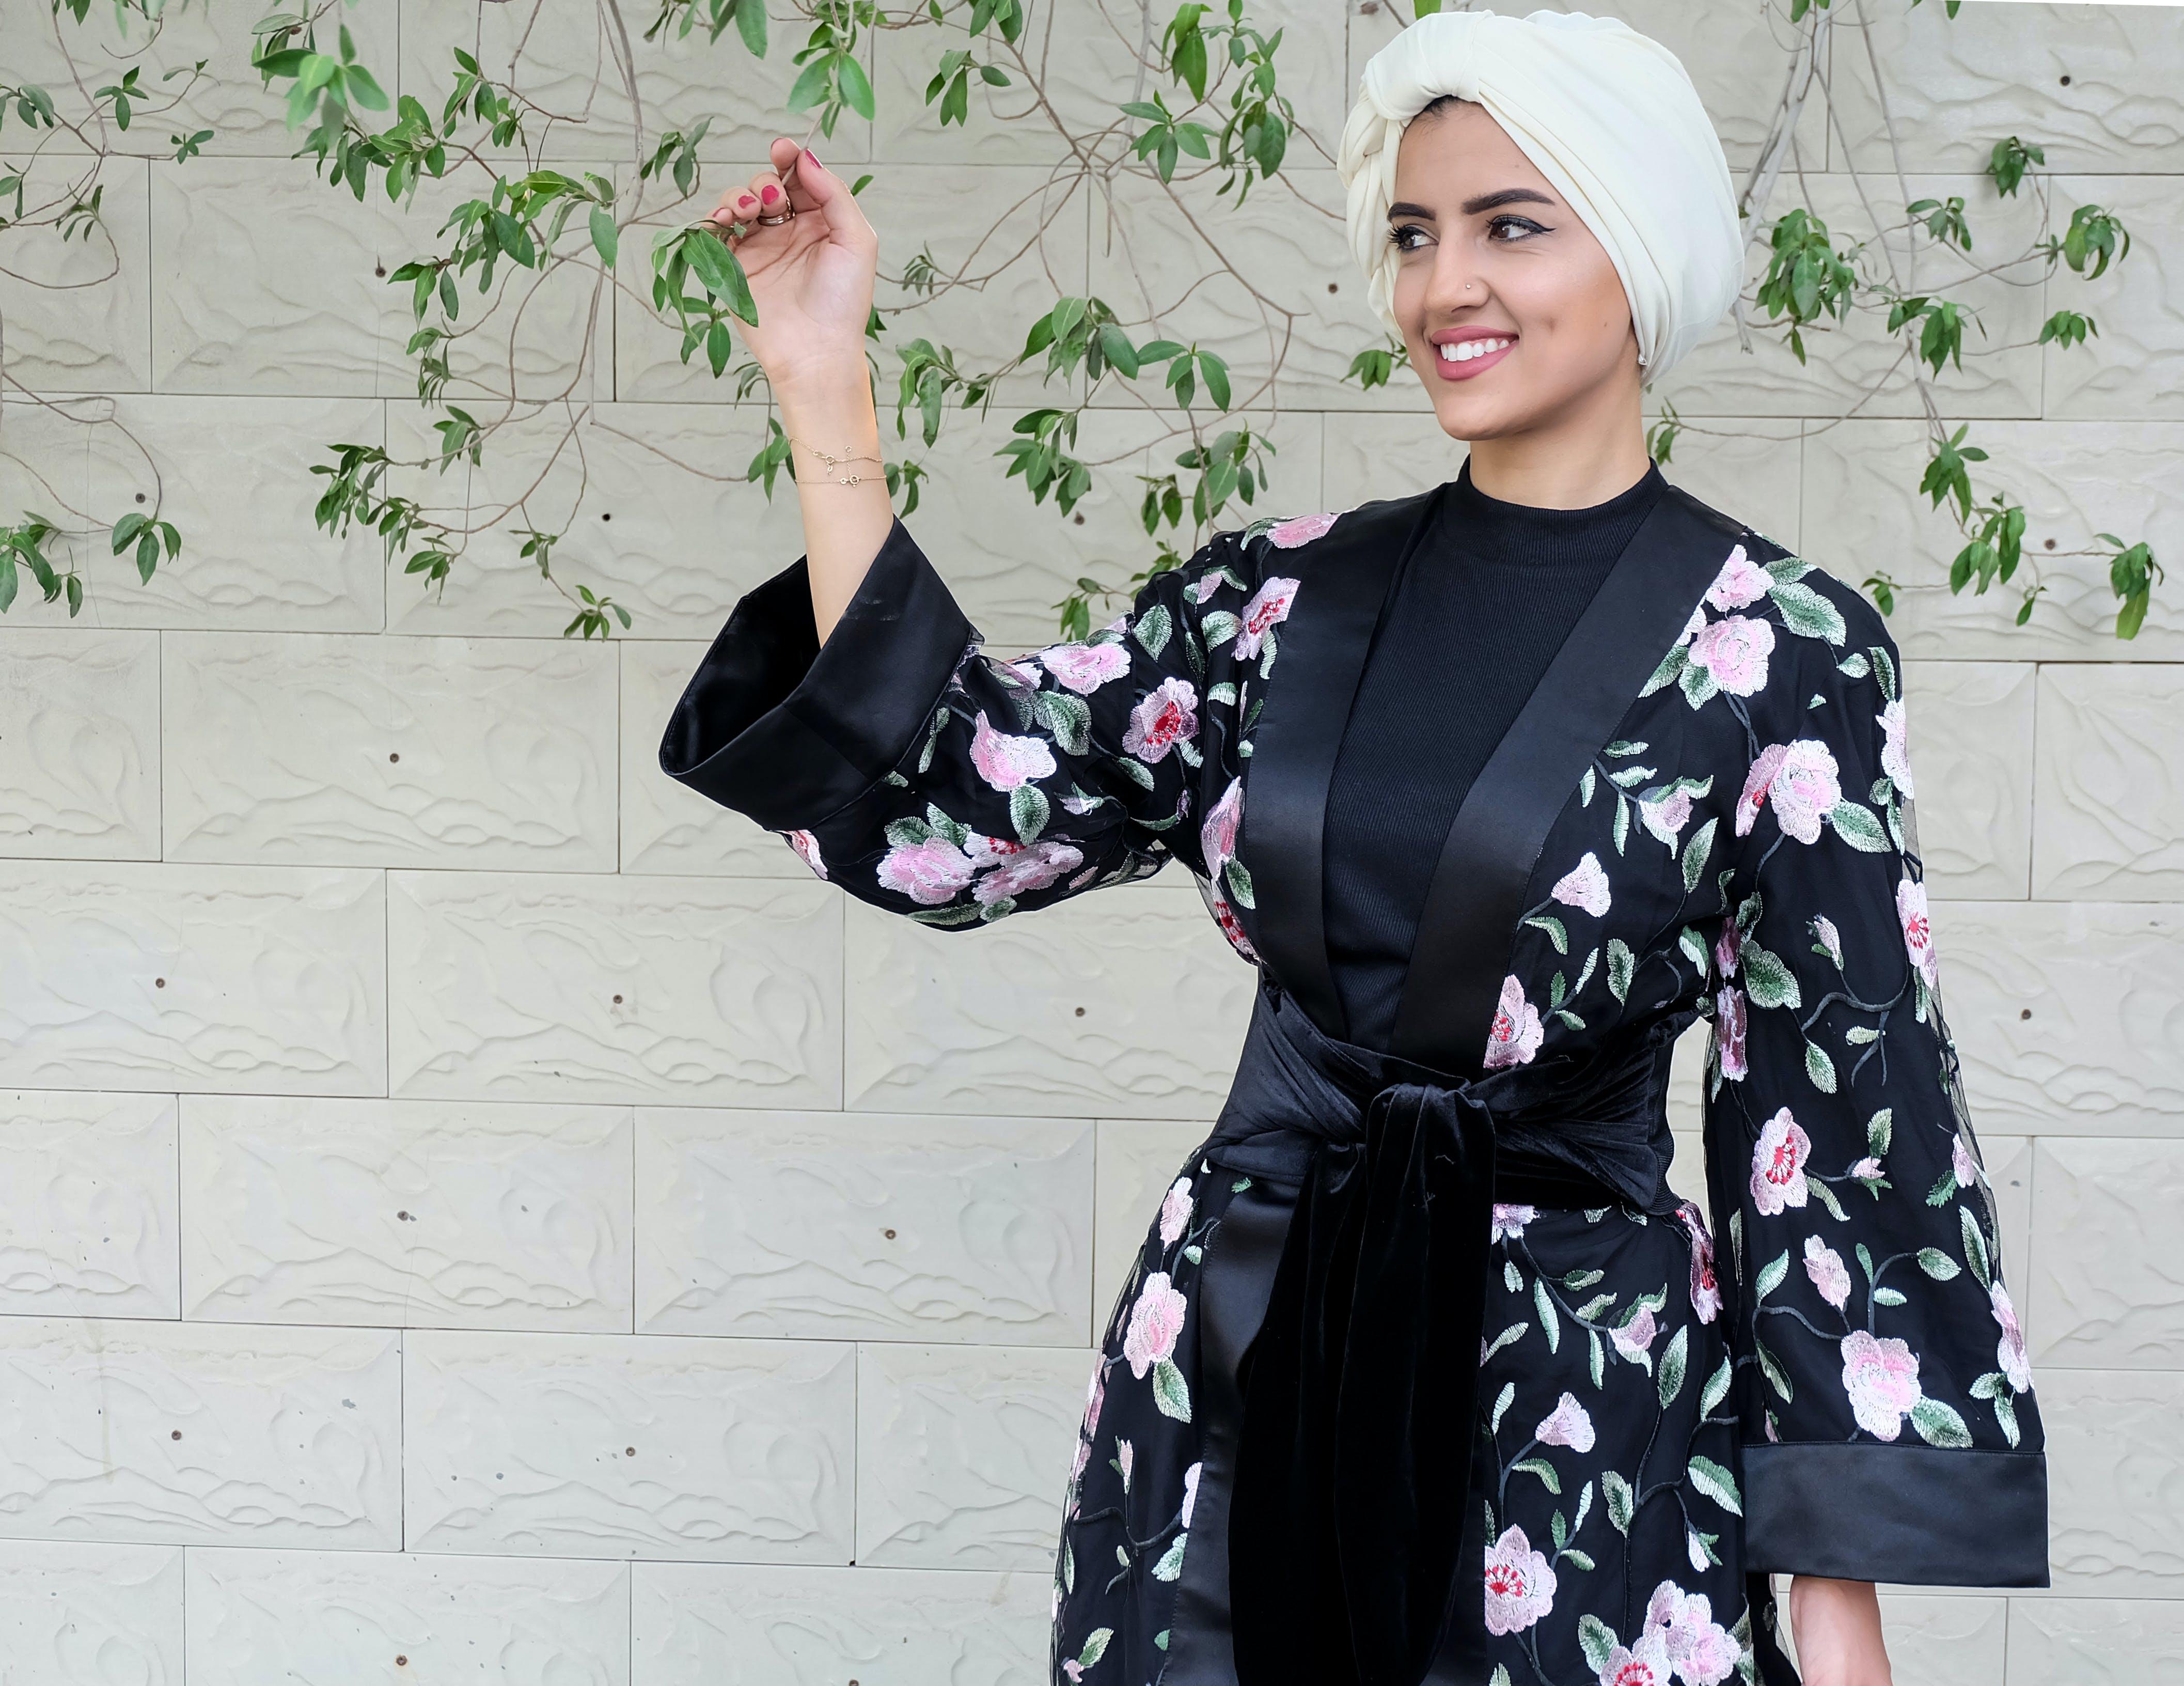 Woman Wearing Black And Pink Floral Kimono